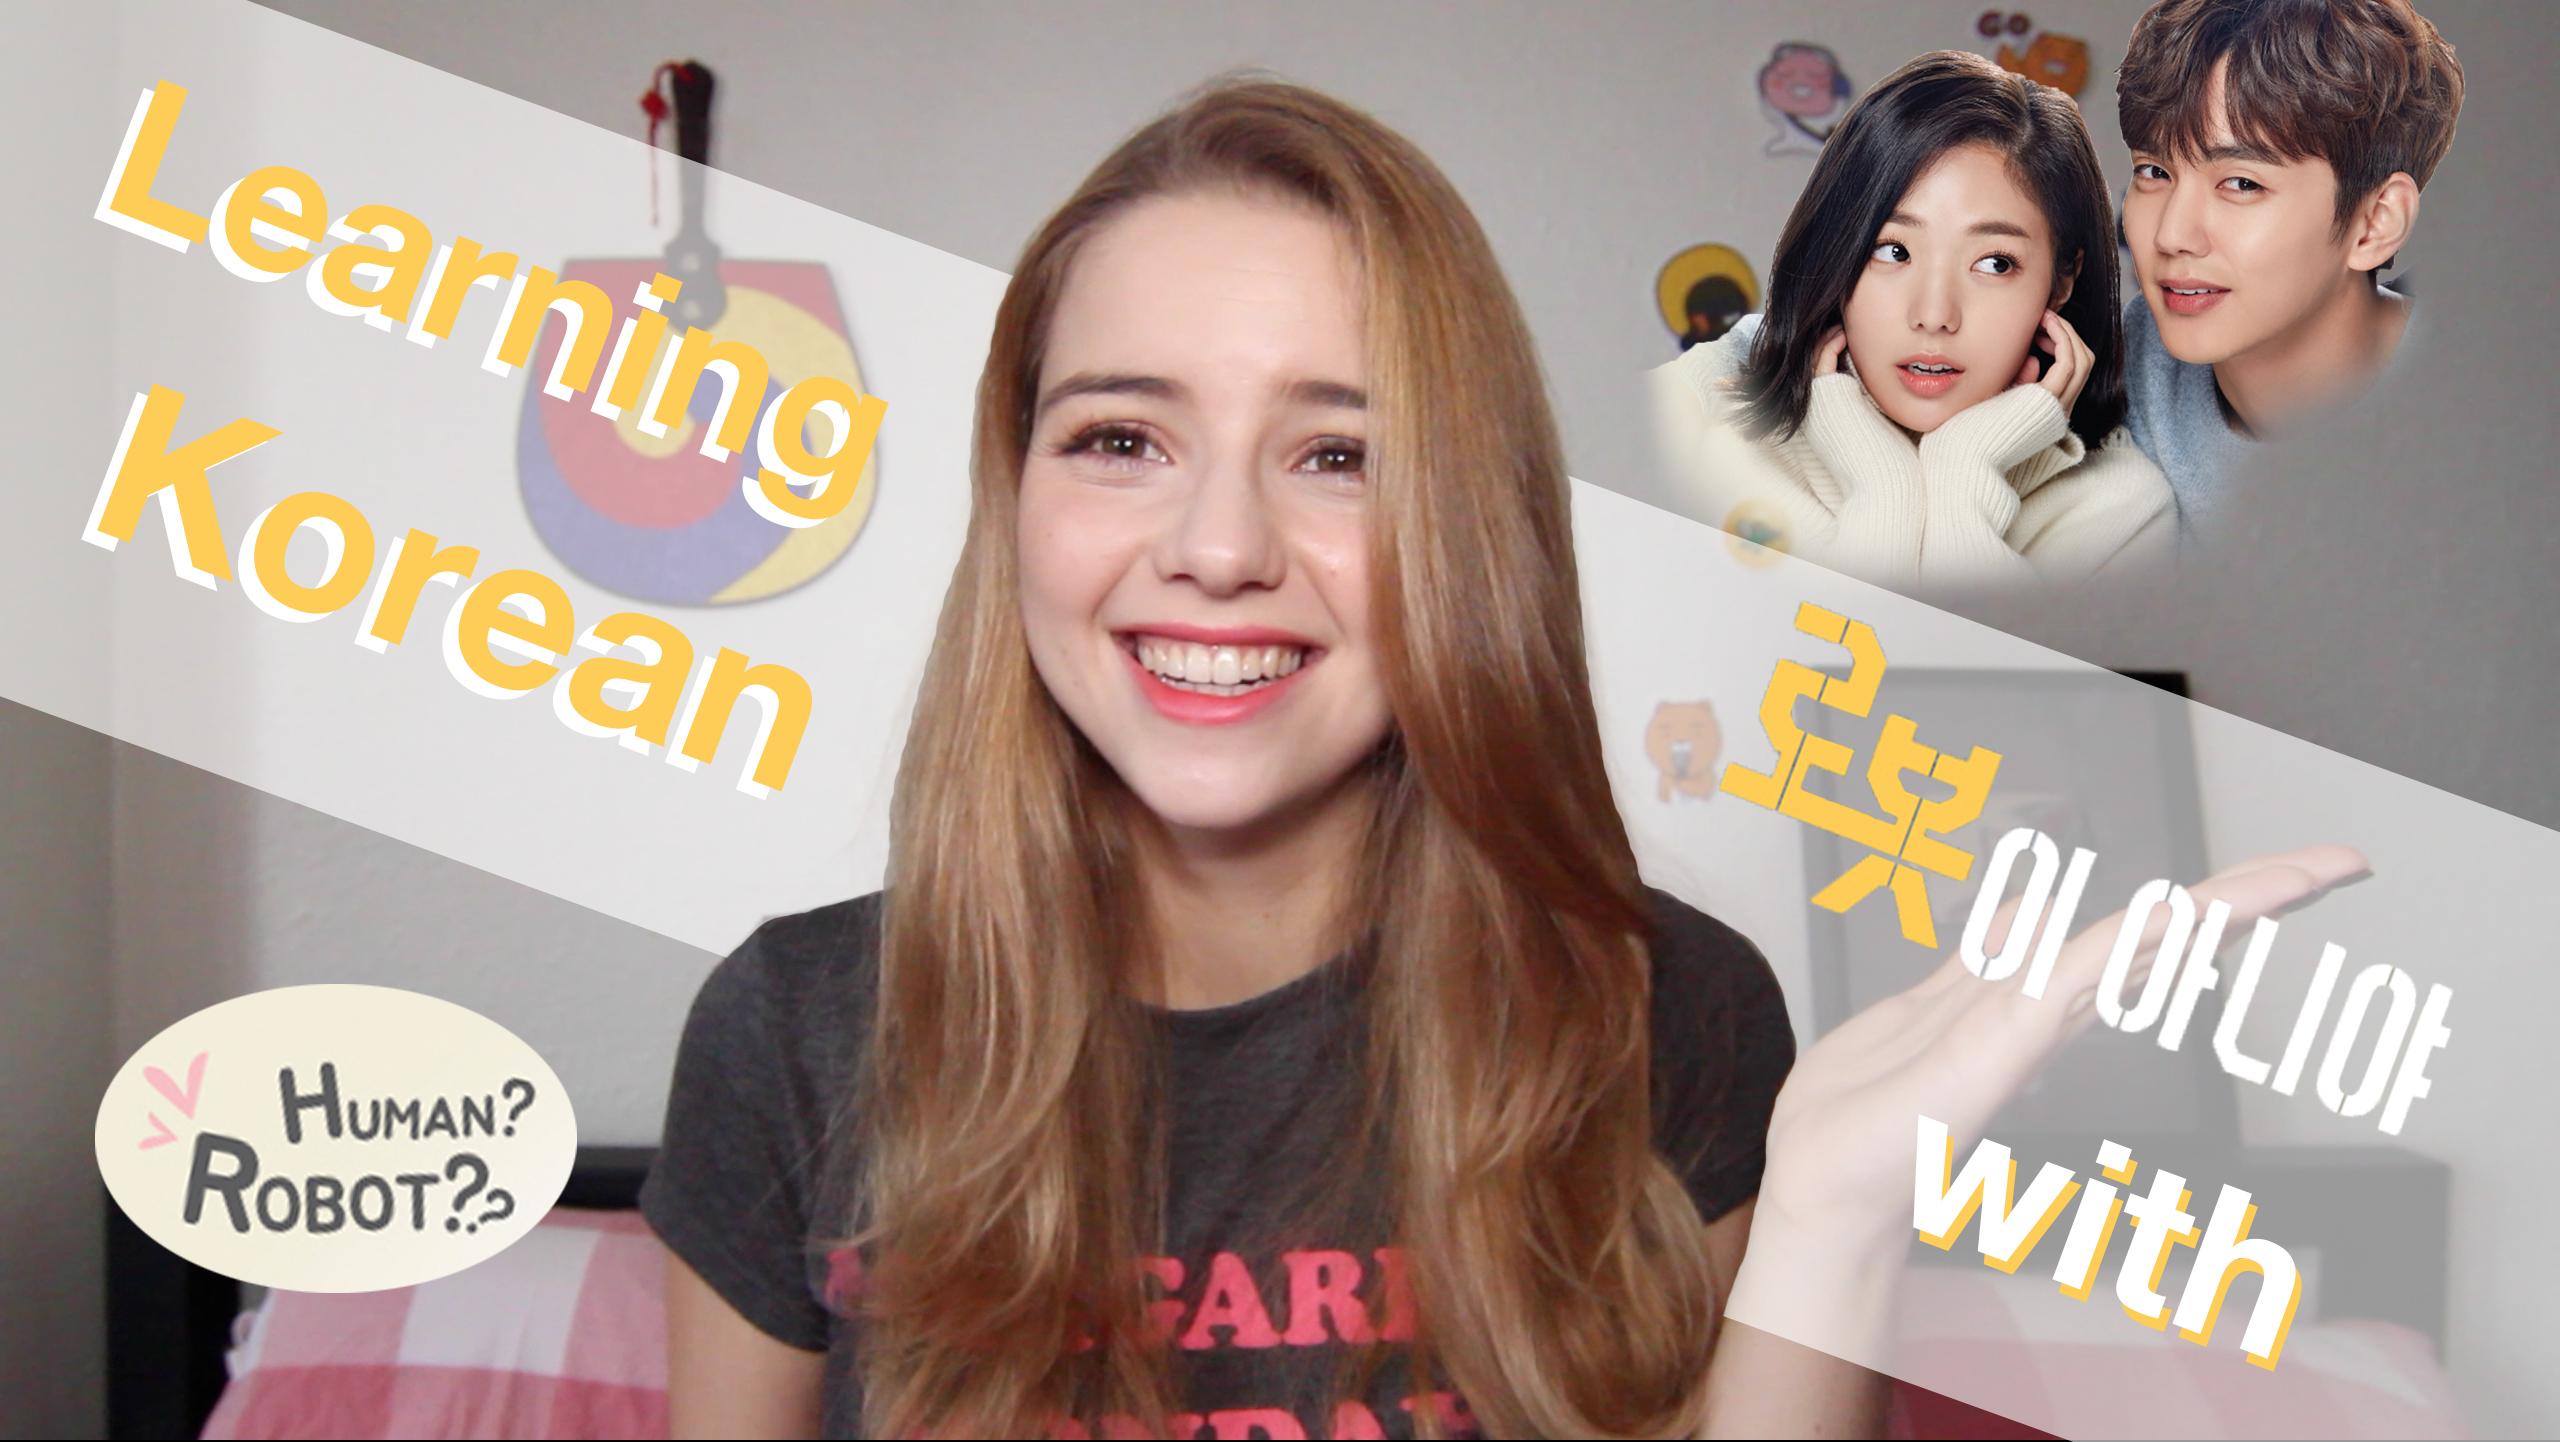 Margarita Episodio 21: Learn Korean with 로봇이 아니야!